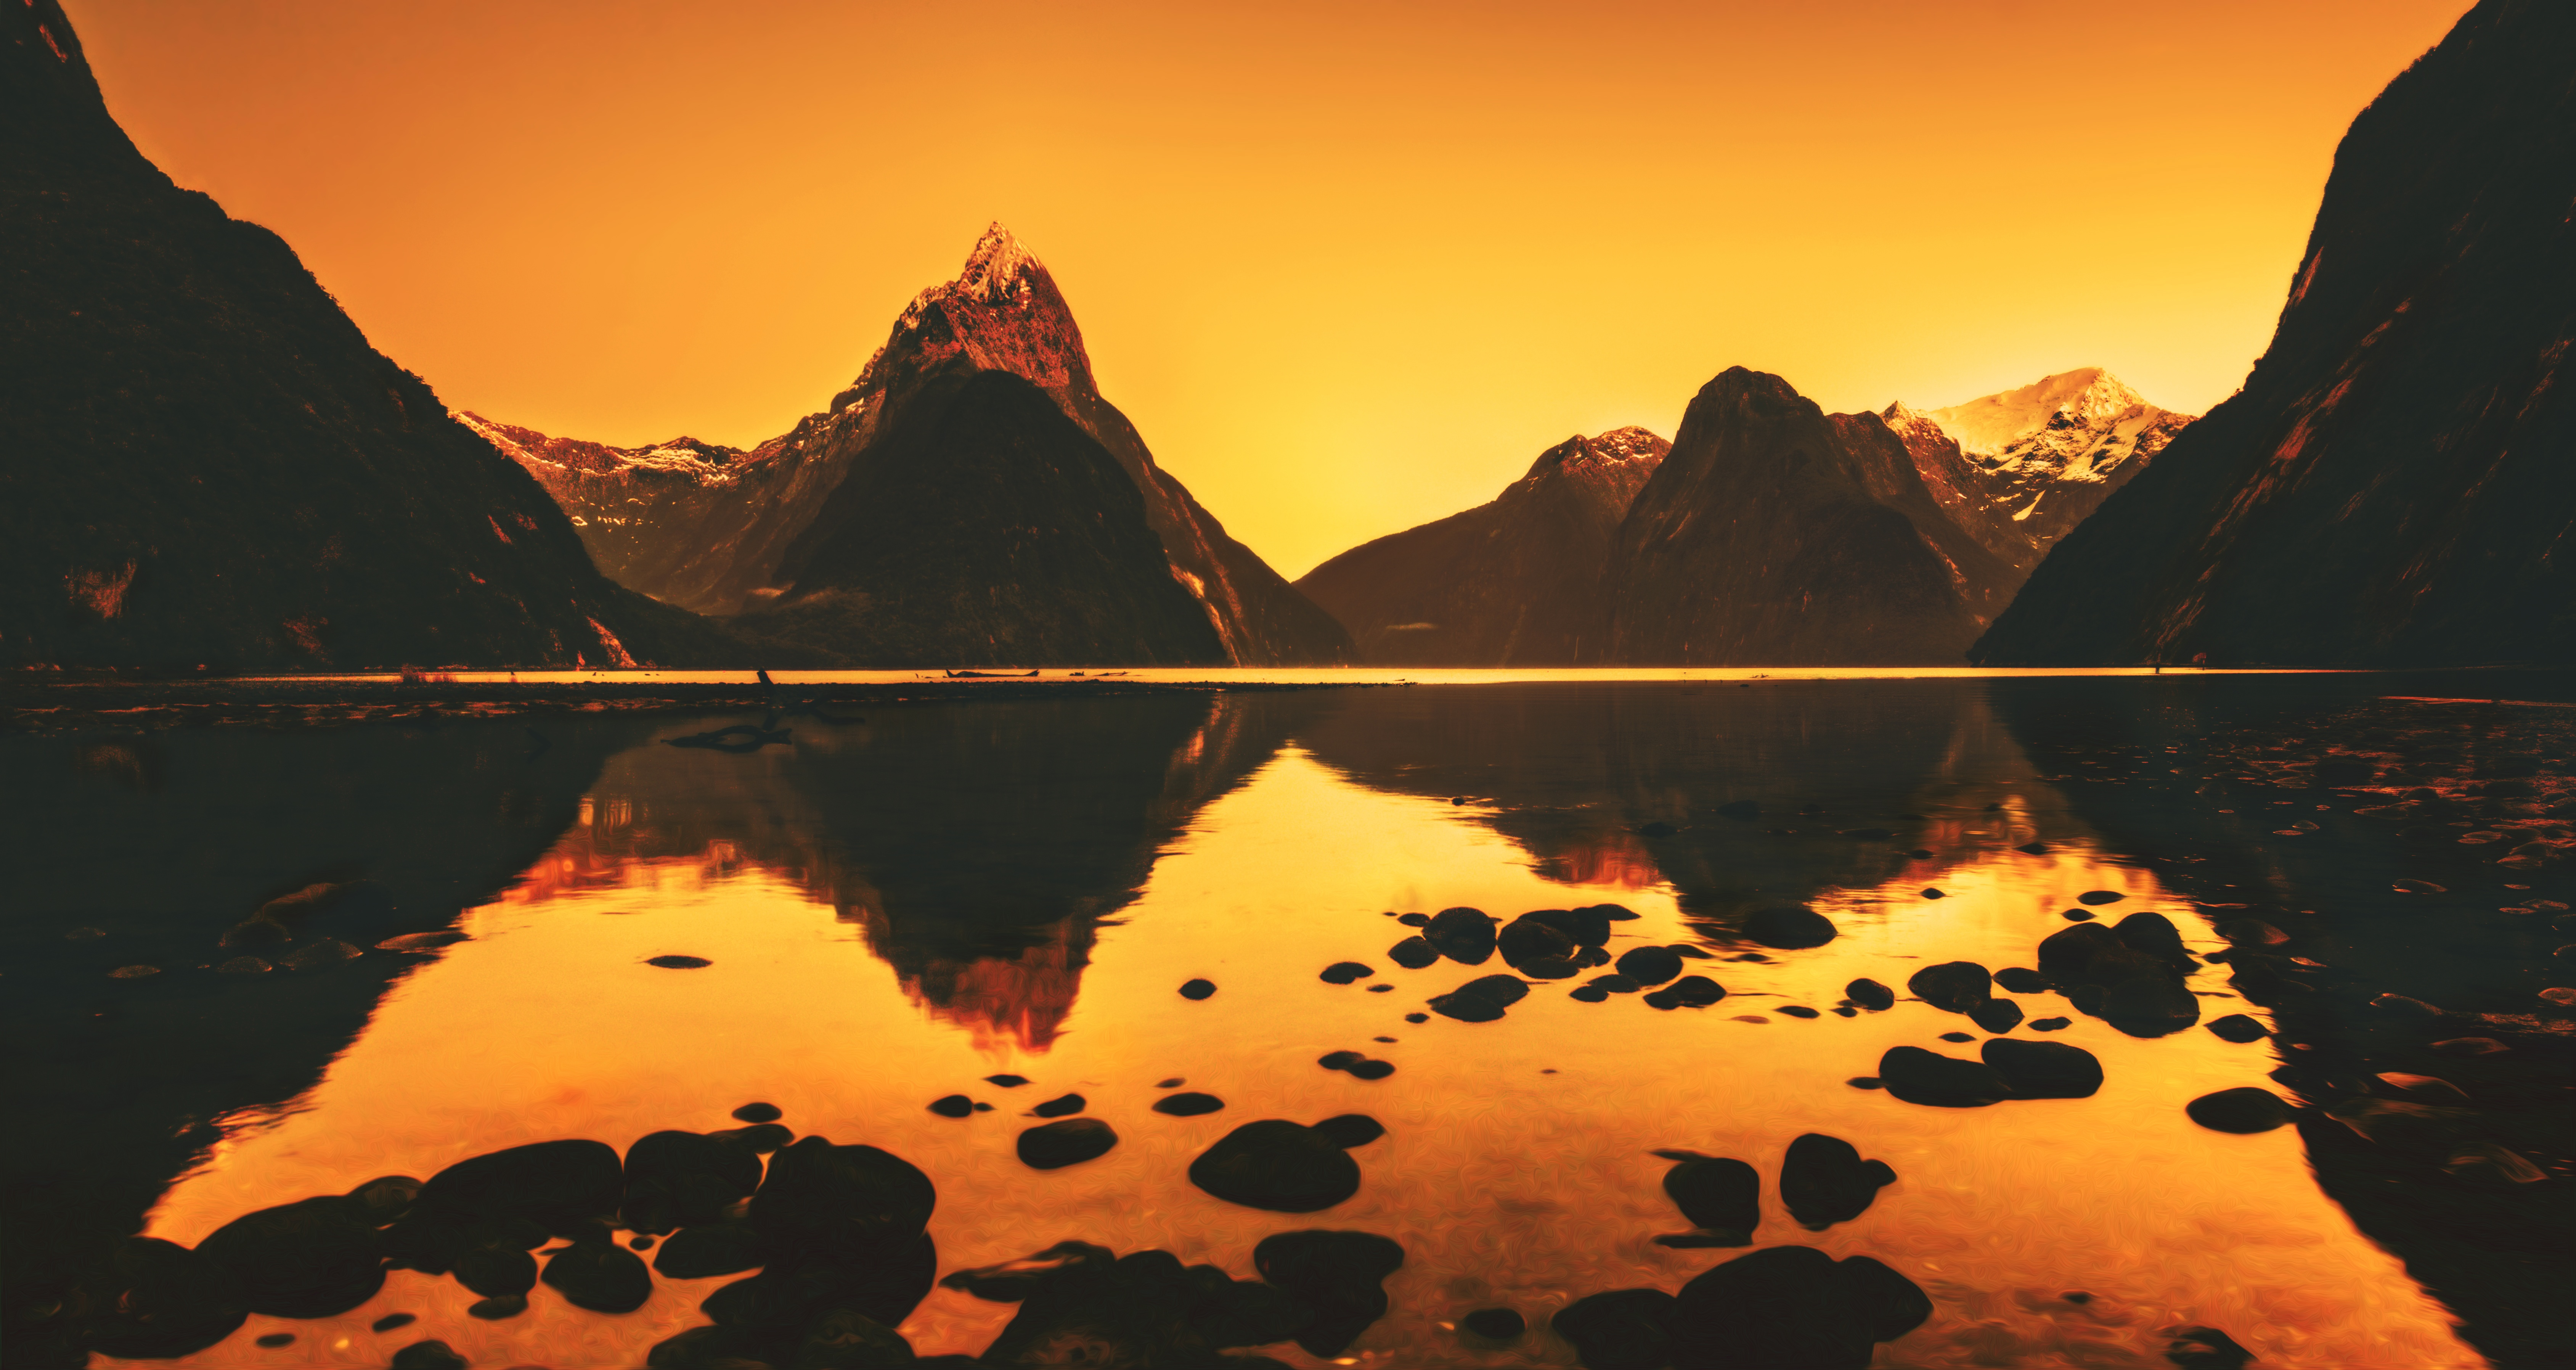 Milford Sound Mitre Peak Reflection Mountain Fjord New Zealand 6756x3592